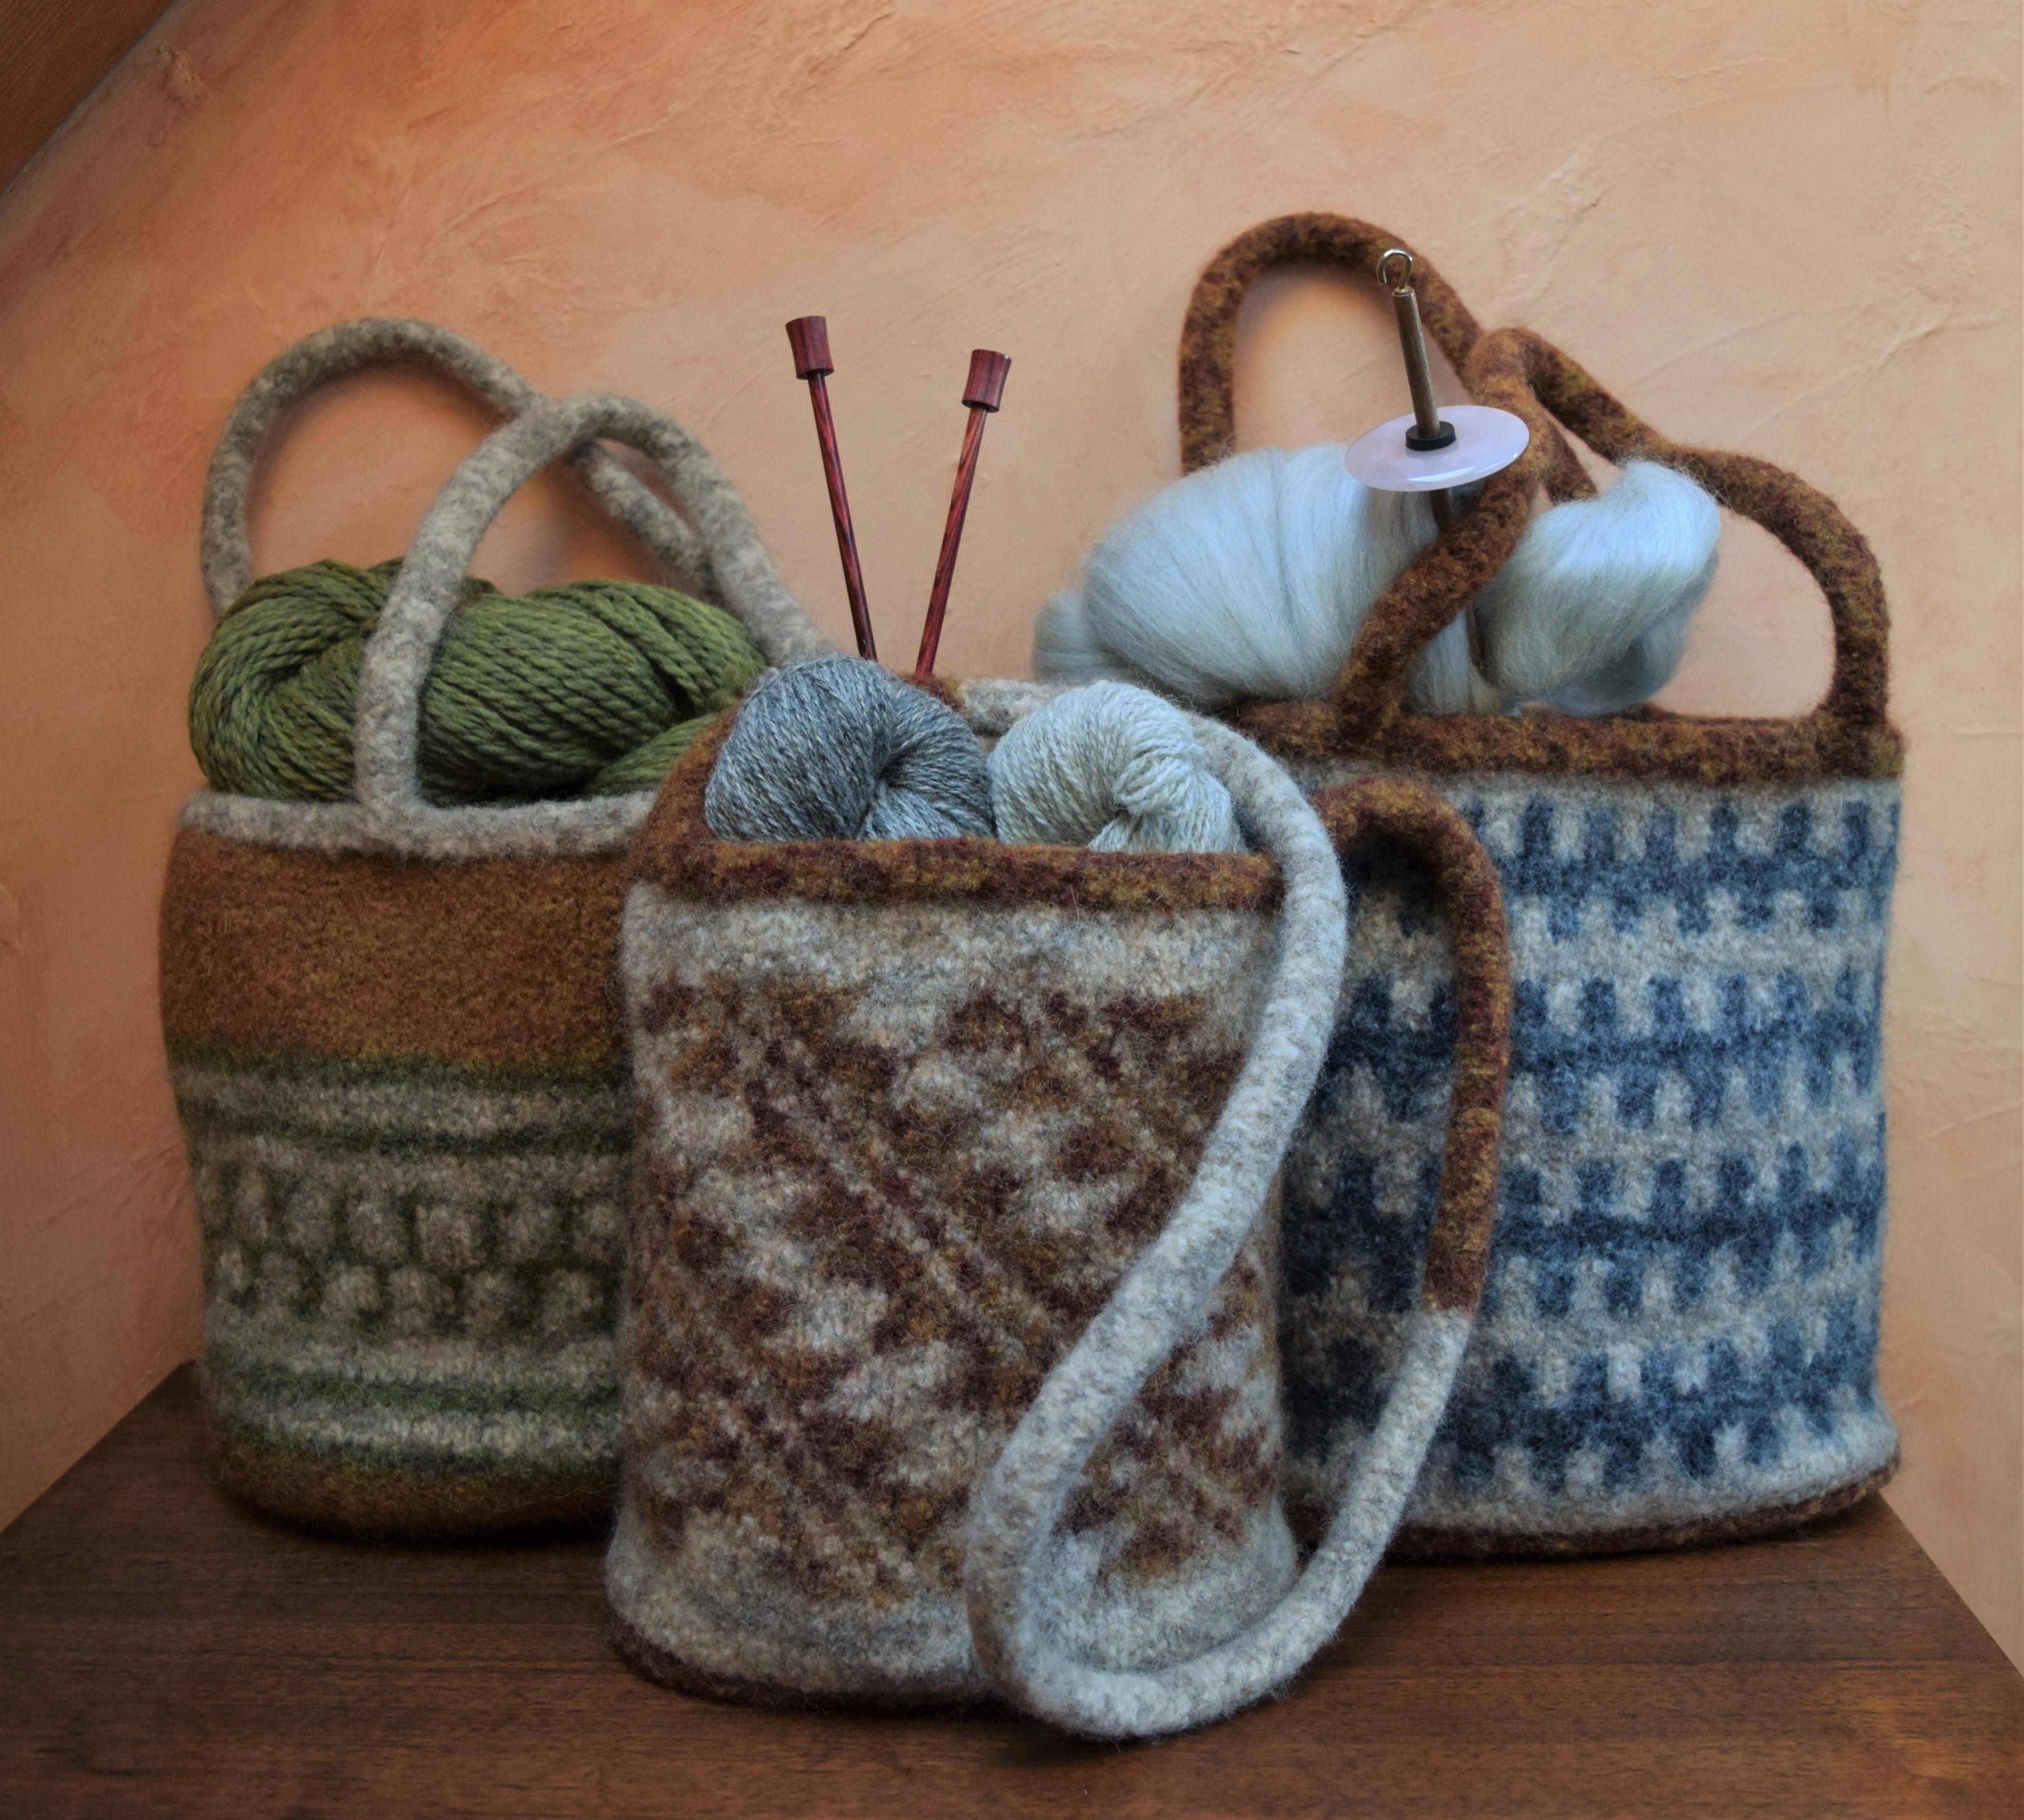 jenjoycedesign© Maiya' kma Felted Wool Bags